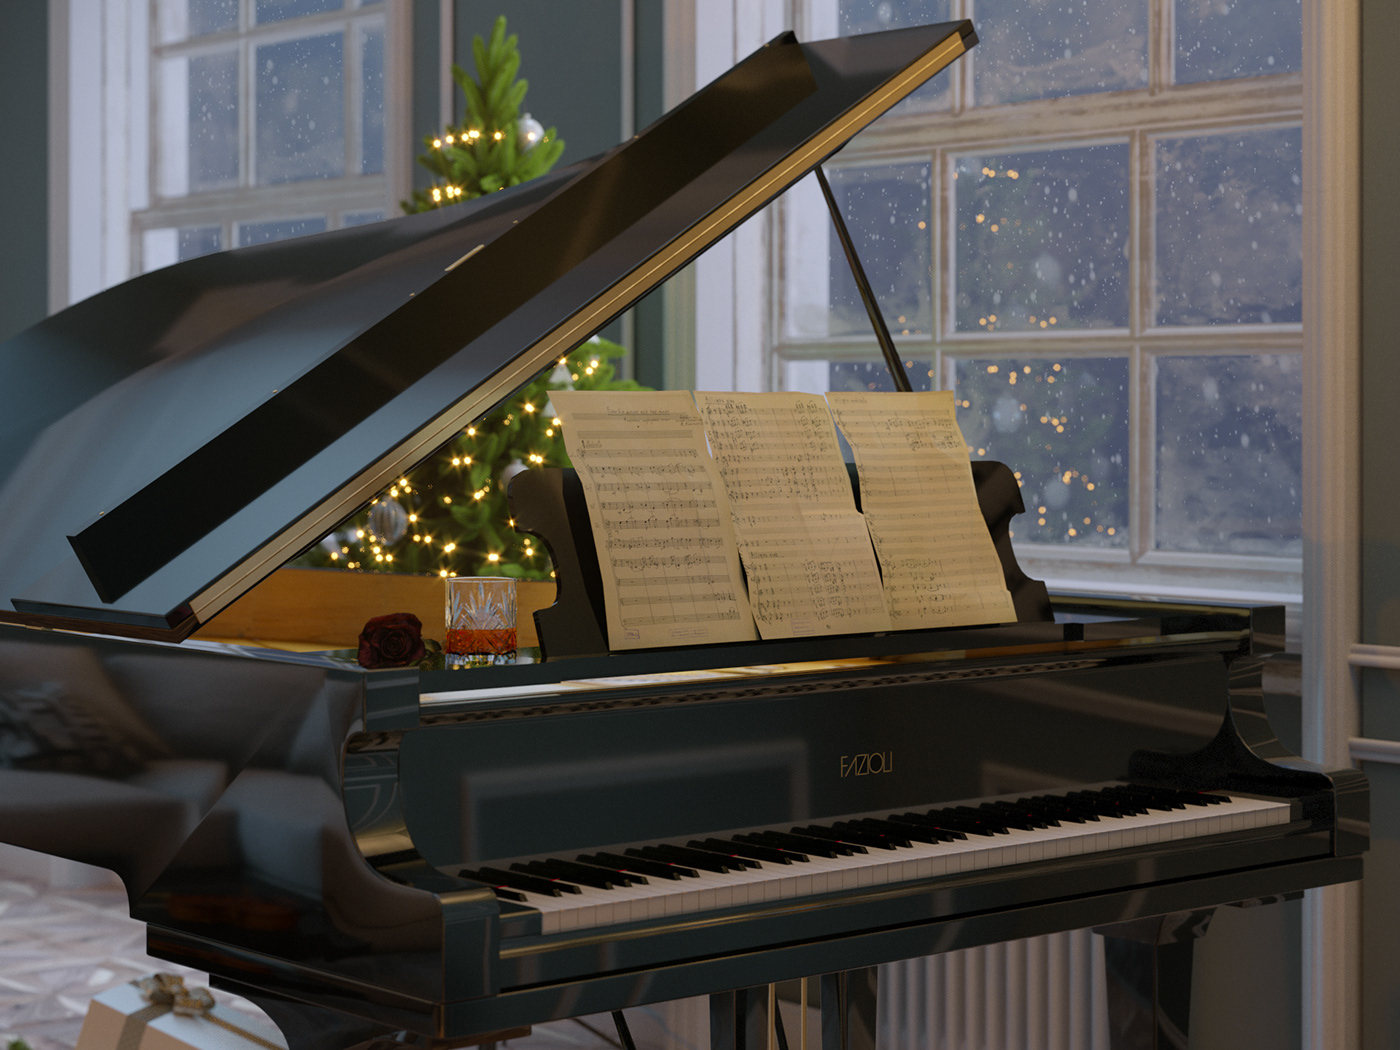 Image may contain: music, piano and musical keyboard